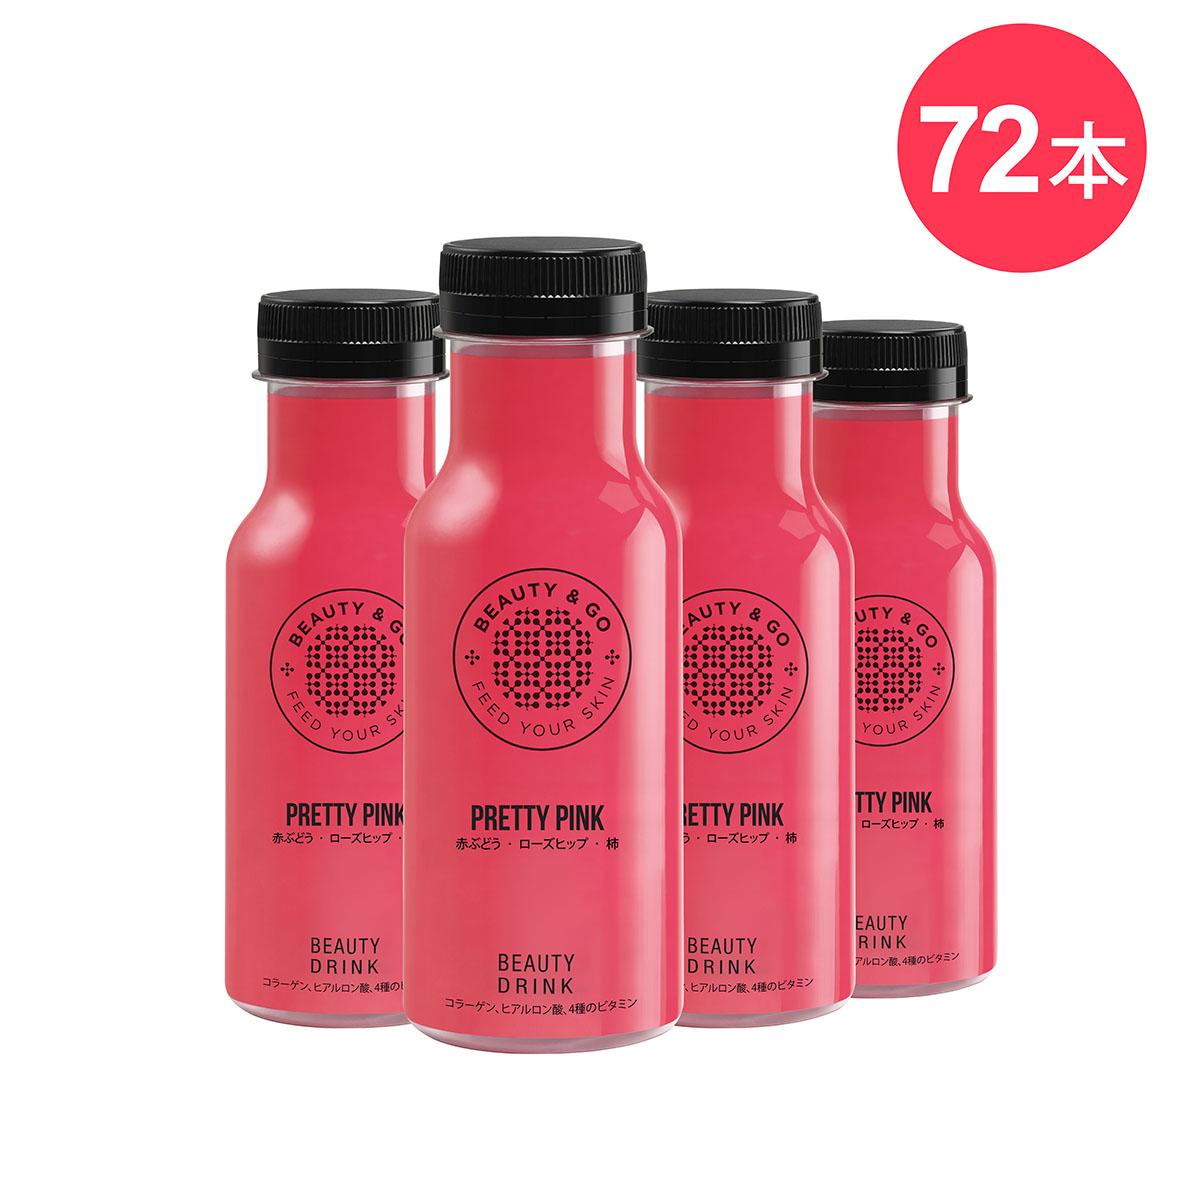 BEAUTY&GO PRETTY PINK (プリティーピンク)美容ドリンク ― 72日間のケア (72本)